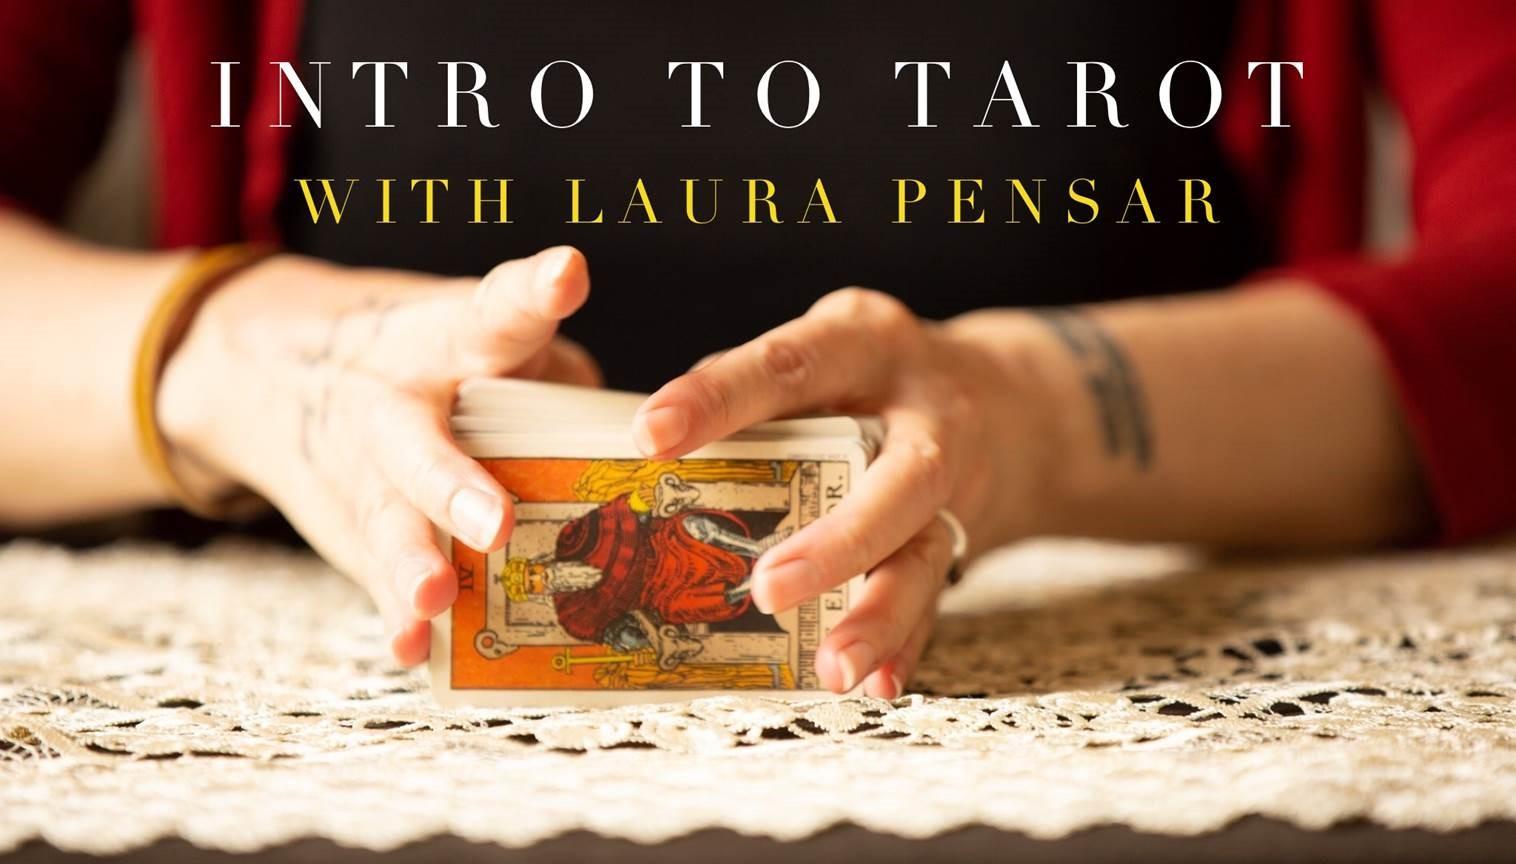 Hands on a table shuffling tarot cards